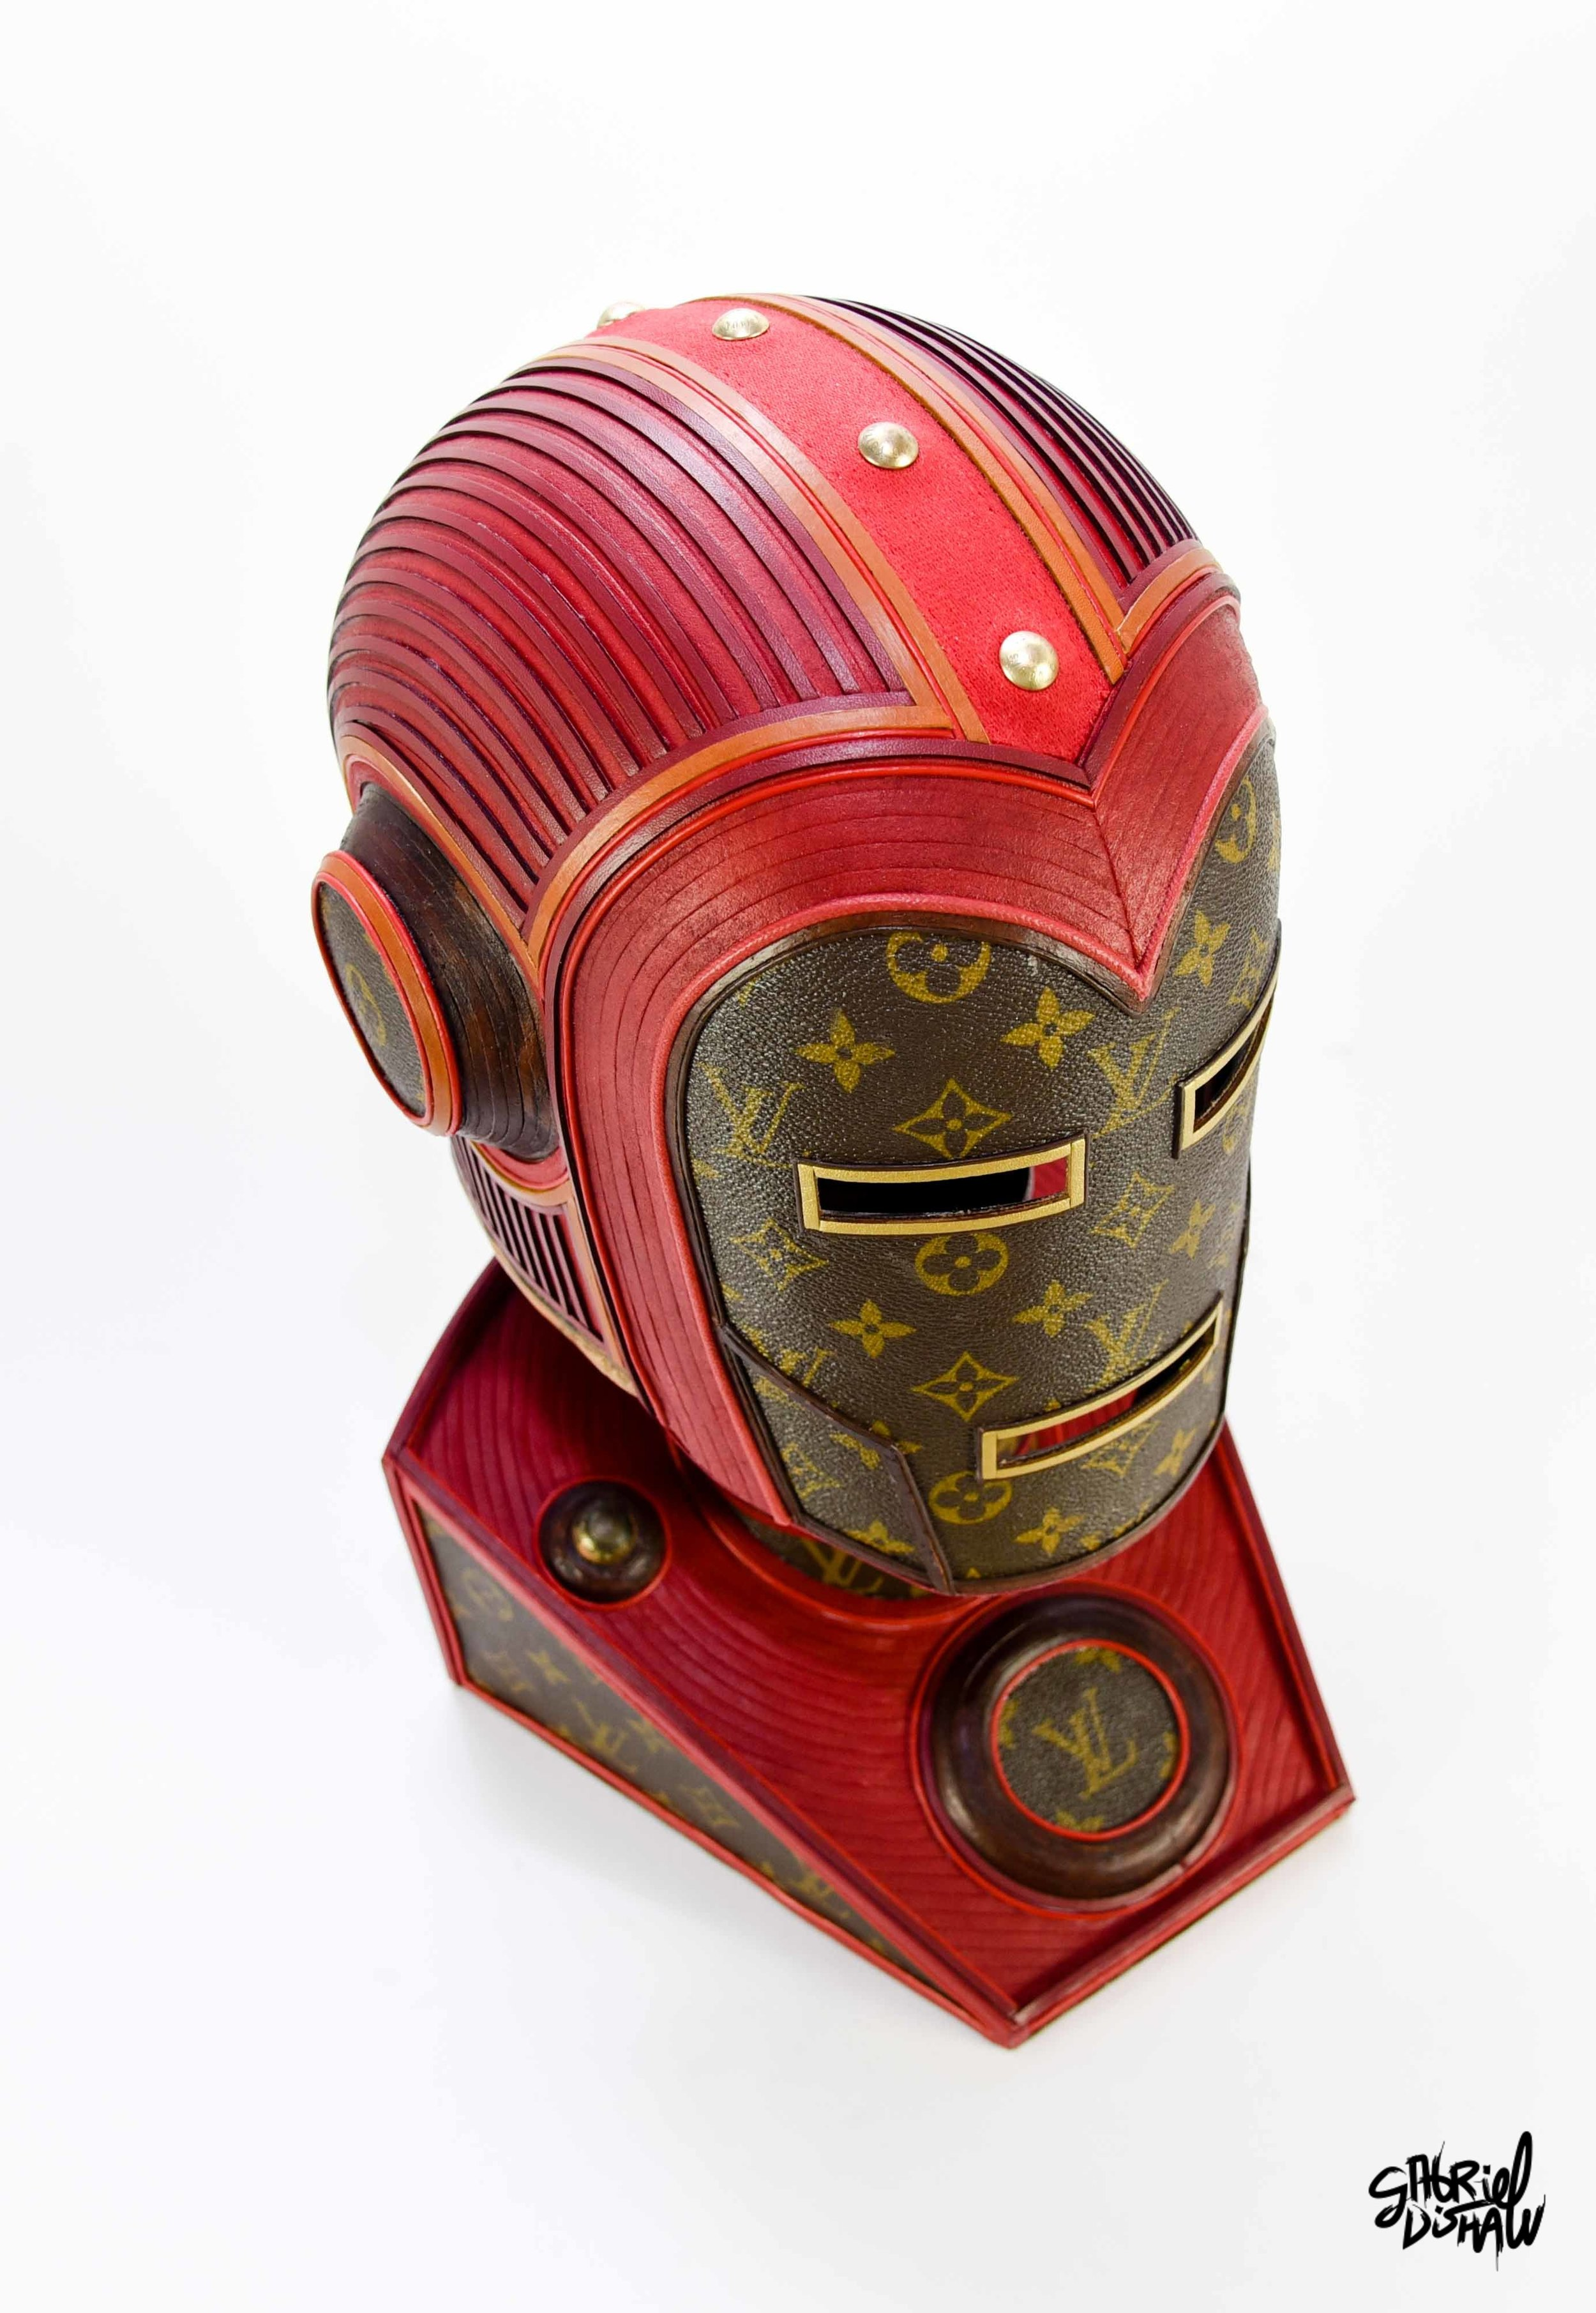 Gabriel Dishaw Vintage Iron Man LV-9971.jpg